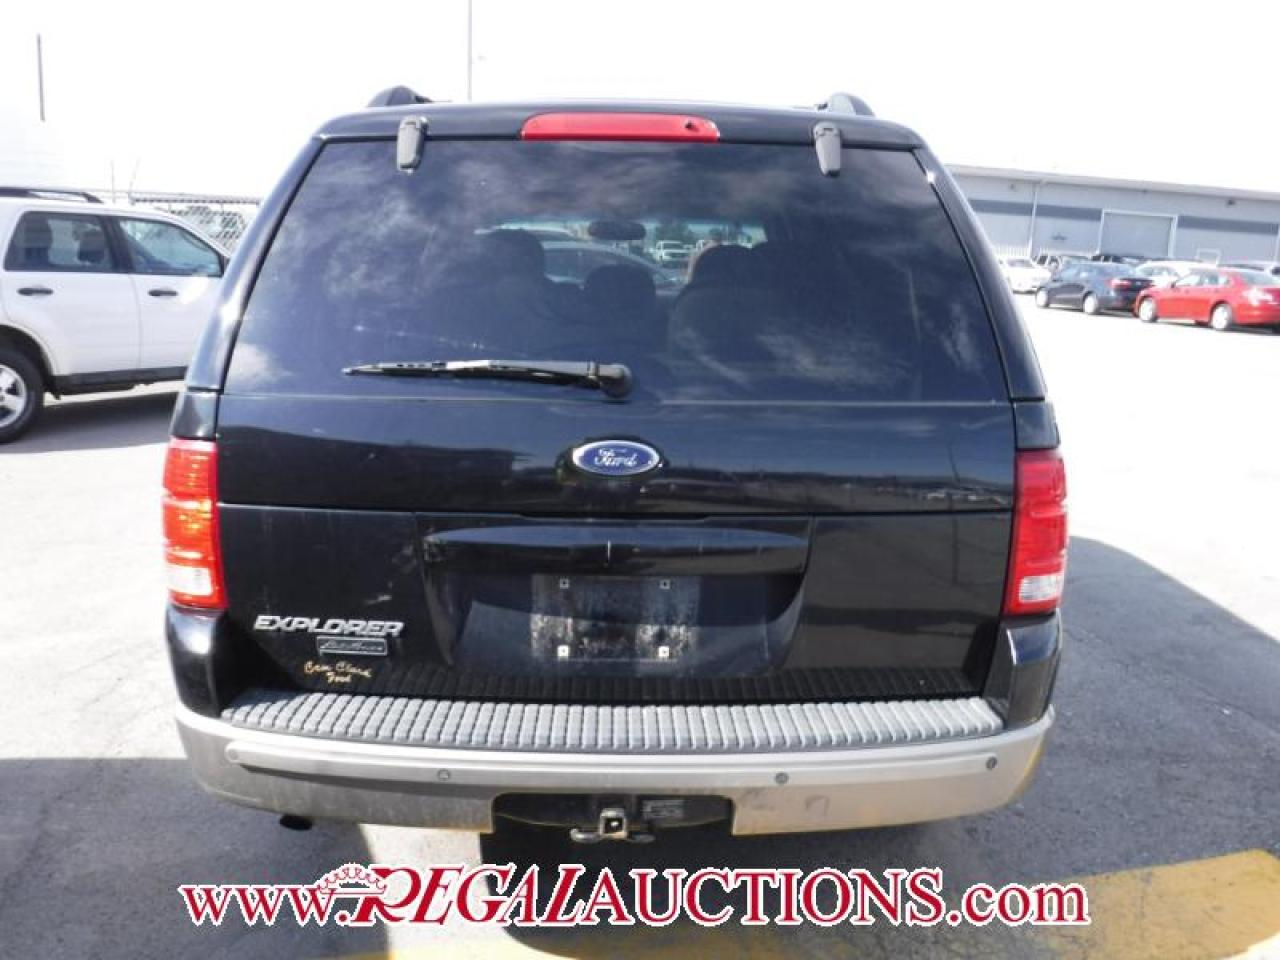 2004 Ford EXPLORER EDDIE BAUER 4D UTILITY 4WD